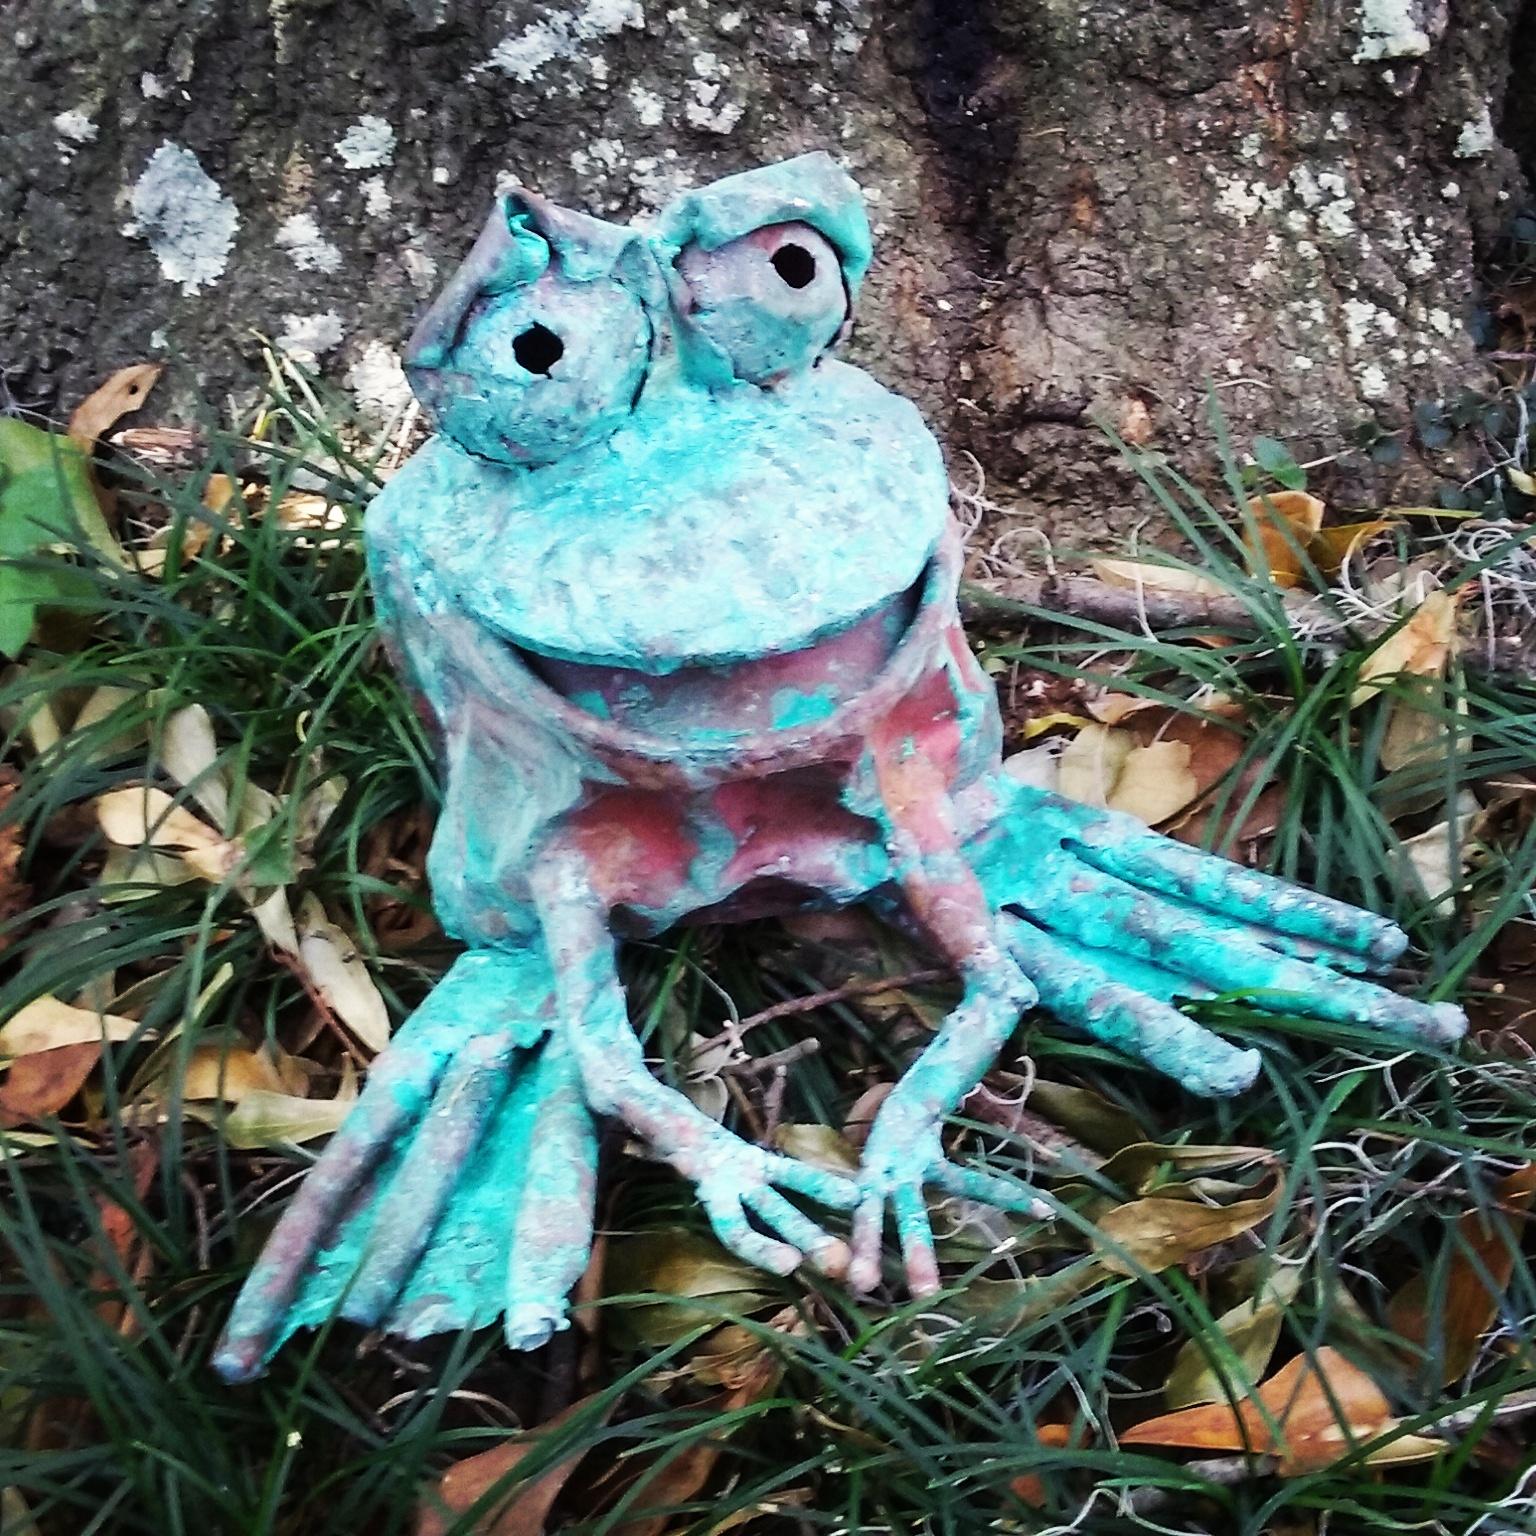 Frog, copper, metal, art, sculpture, Beau Smith, Todd Miller